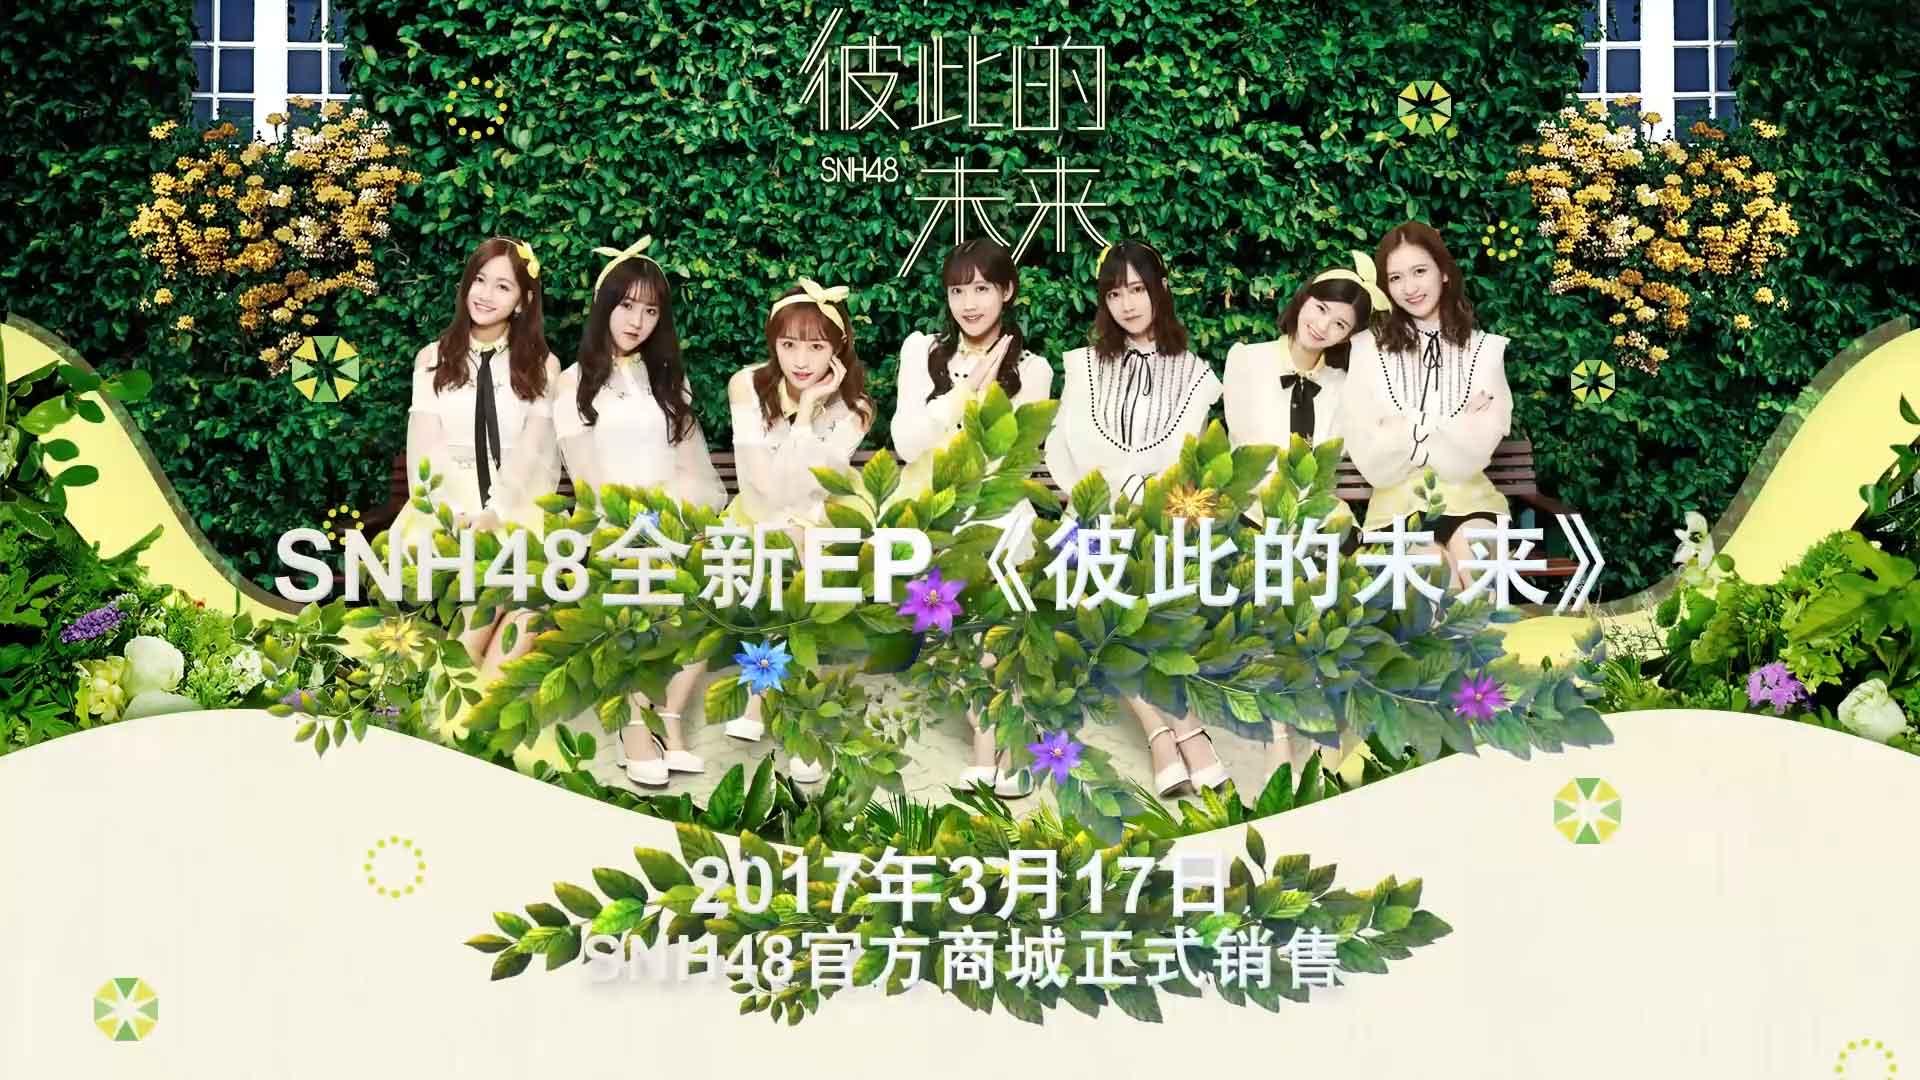 [1080P] SNH48 - 彼此的未来 官方HD-MV